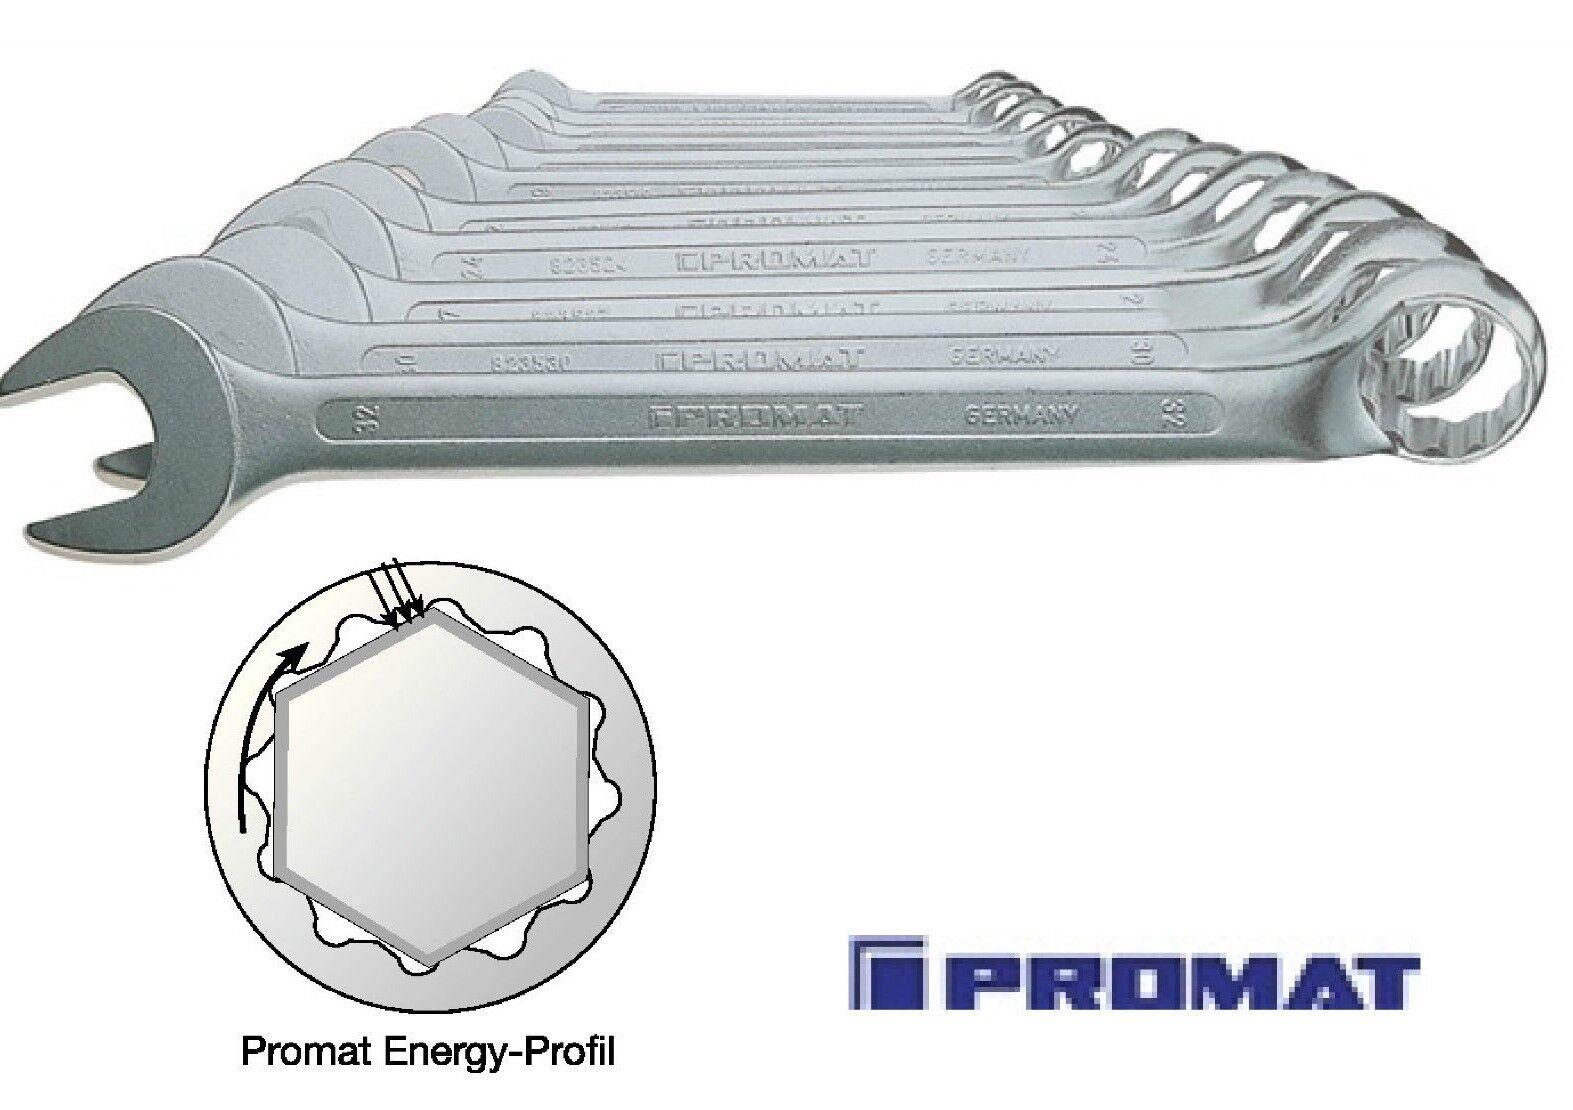 PROMAT RINGMAULSCHLÜSSELSATZ gekröpft Energy-Profil 8 oder 12 tlg.